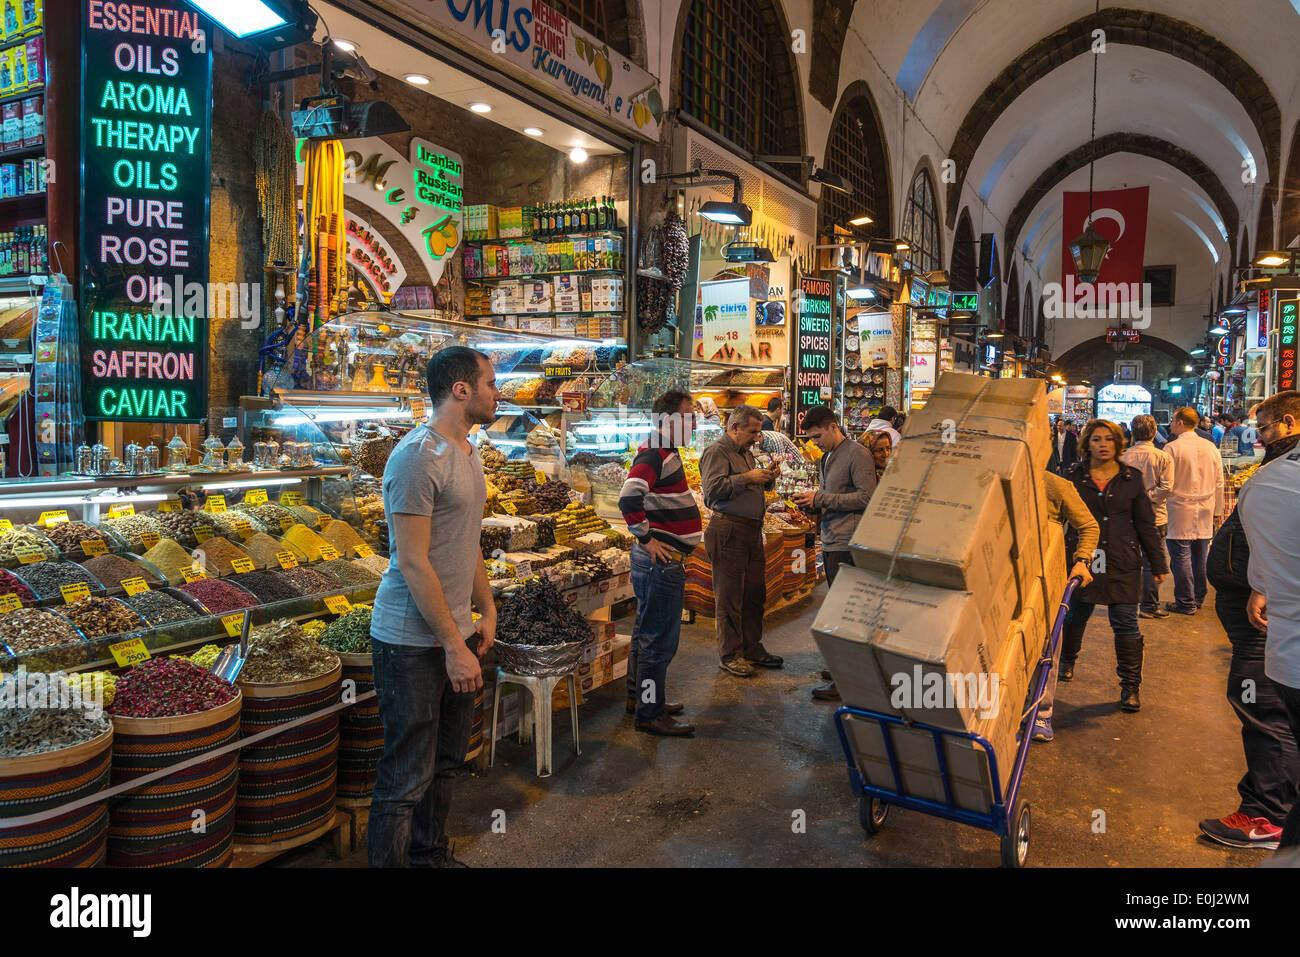 Interior of the Egyptian bazaar, AKA  spice bazaar, Eminonu, Istanbul, Turkey. - Stock Image